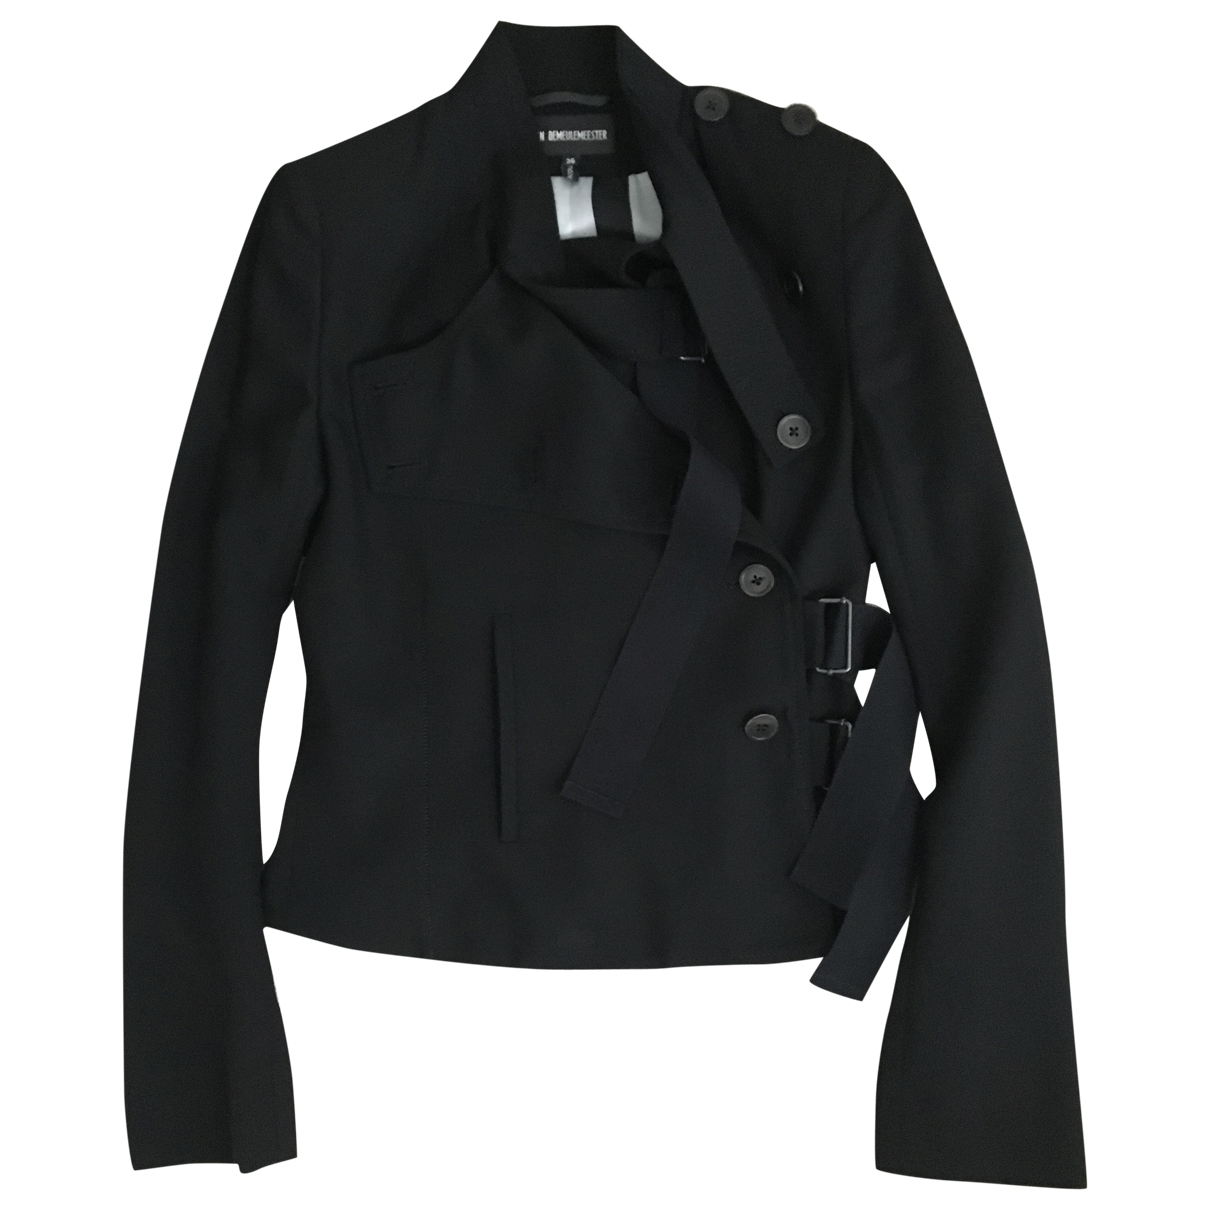 Ann Demeulemeester N Black Wool jacket for Women 36 FR